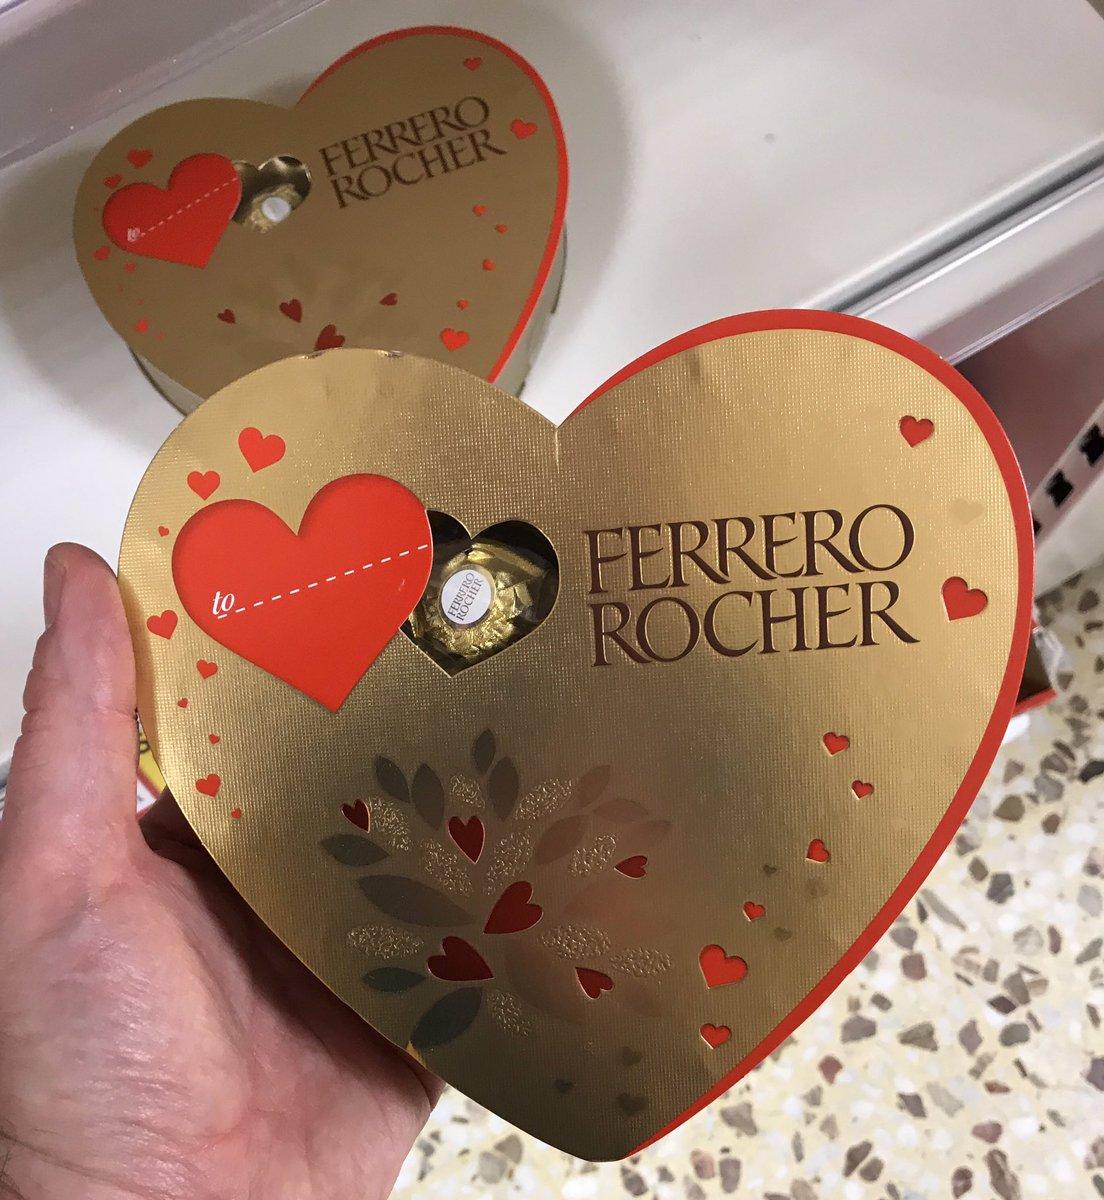 Well This Is New On Twitter Ferrero Rocher Heart At Tesco Ferrerouk Ferrerorocher Ferrero Chocolate Valentines Valentinesday Heart Wellthisisnew Https T Co C2cr7kknj9